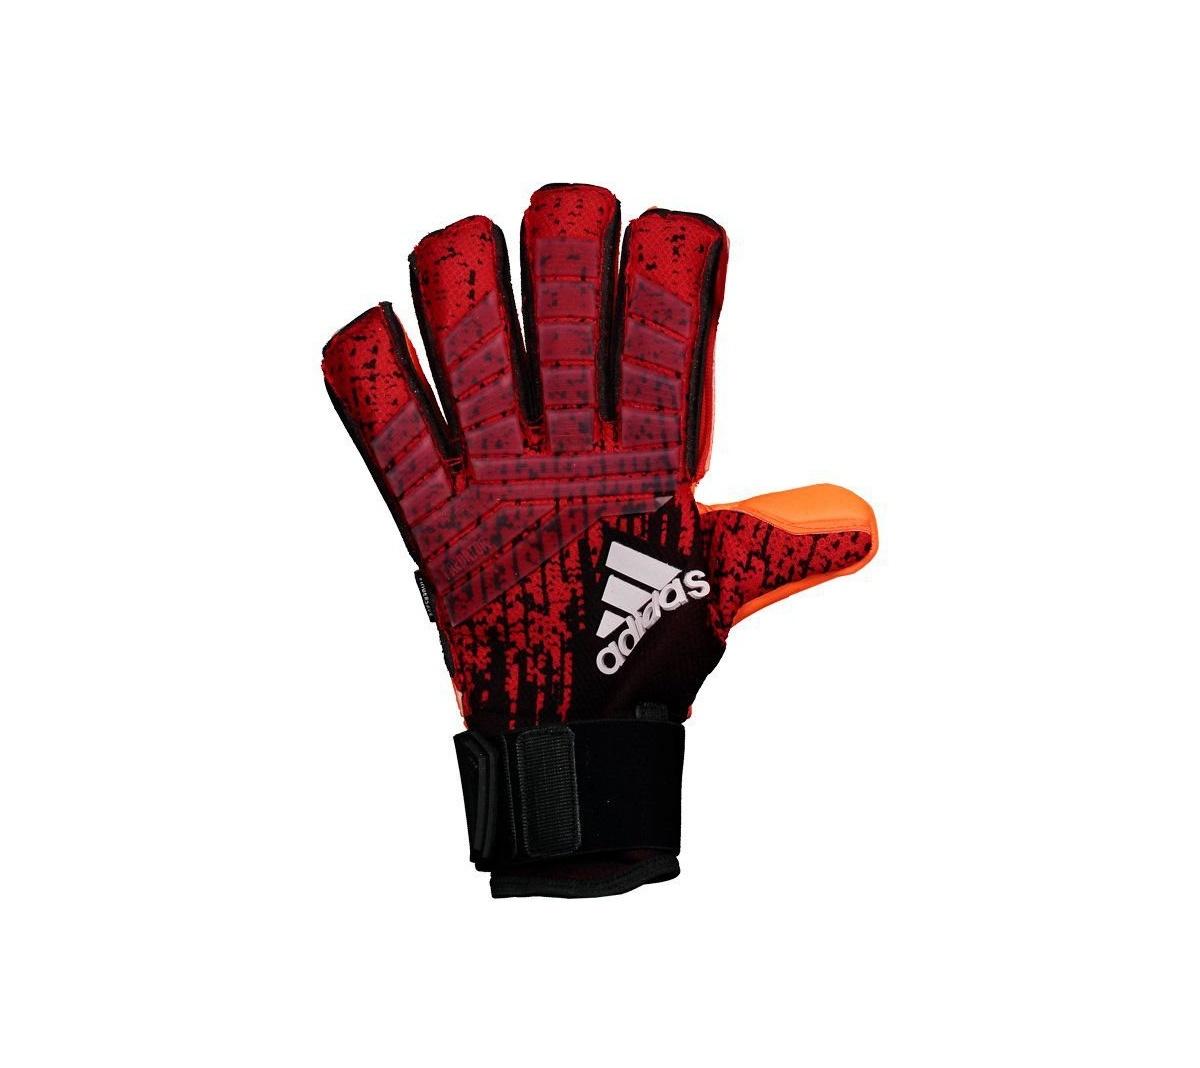 Luva Adidas Predator Pro Finger Save.